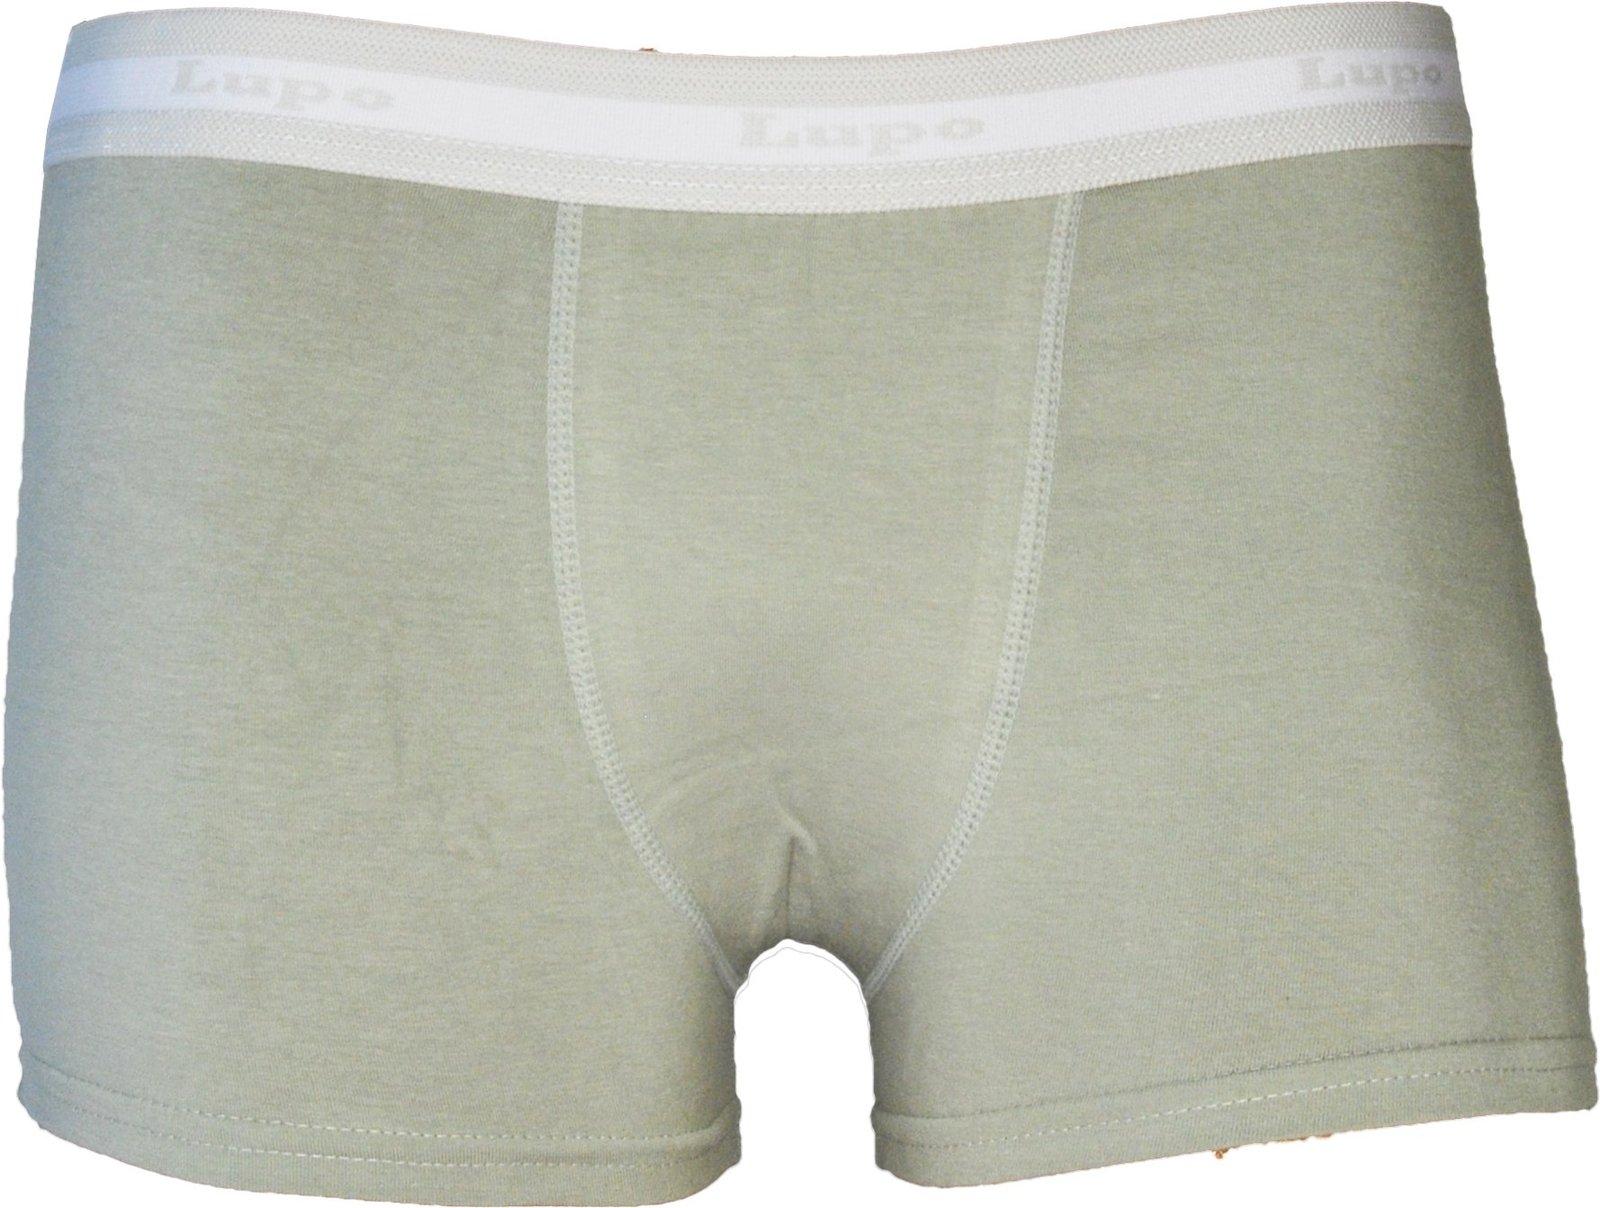 Lupo Mens Horizonal Stripe Fashion Stretch Cotton Boxer Briefs